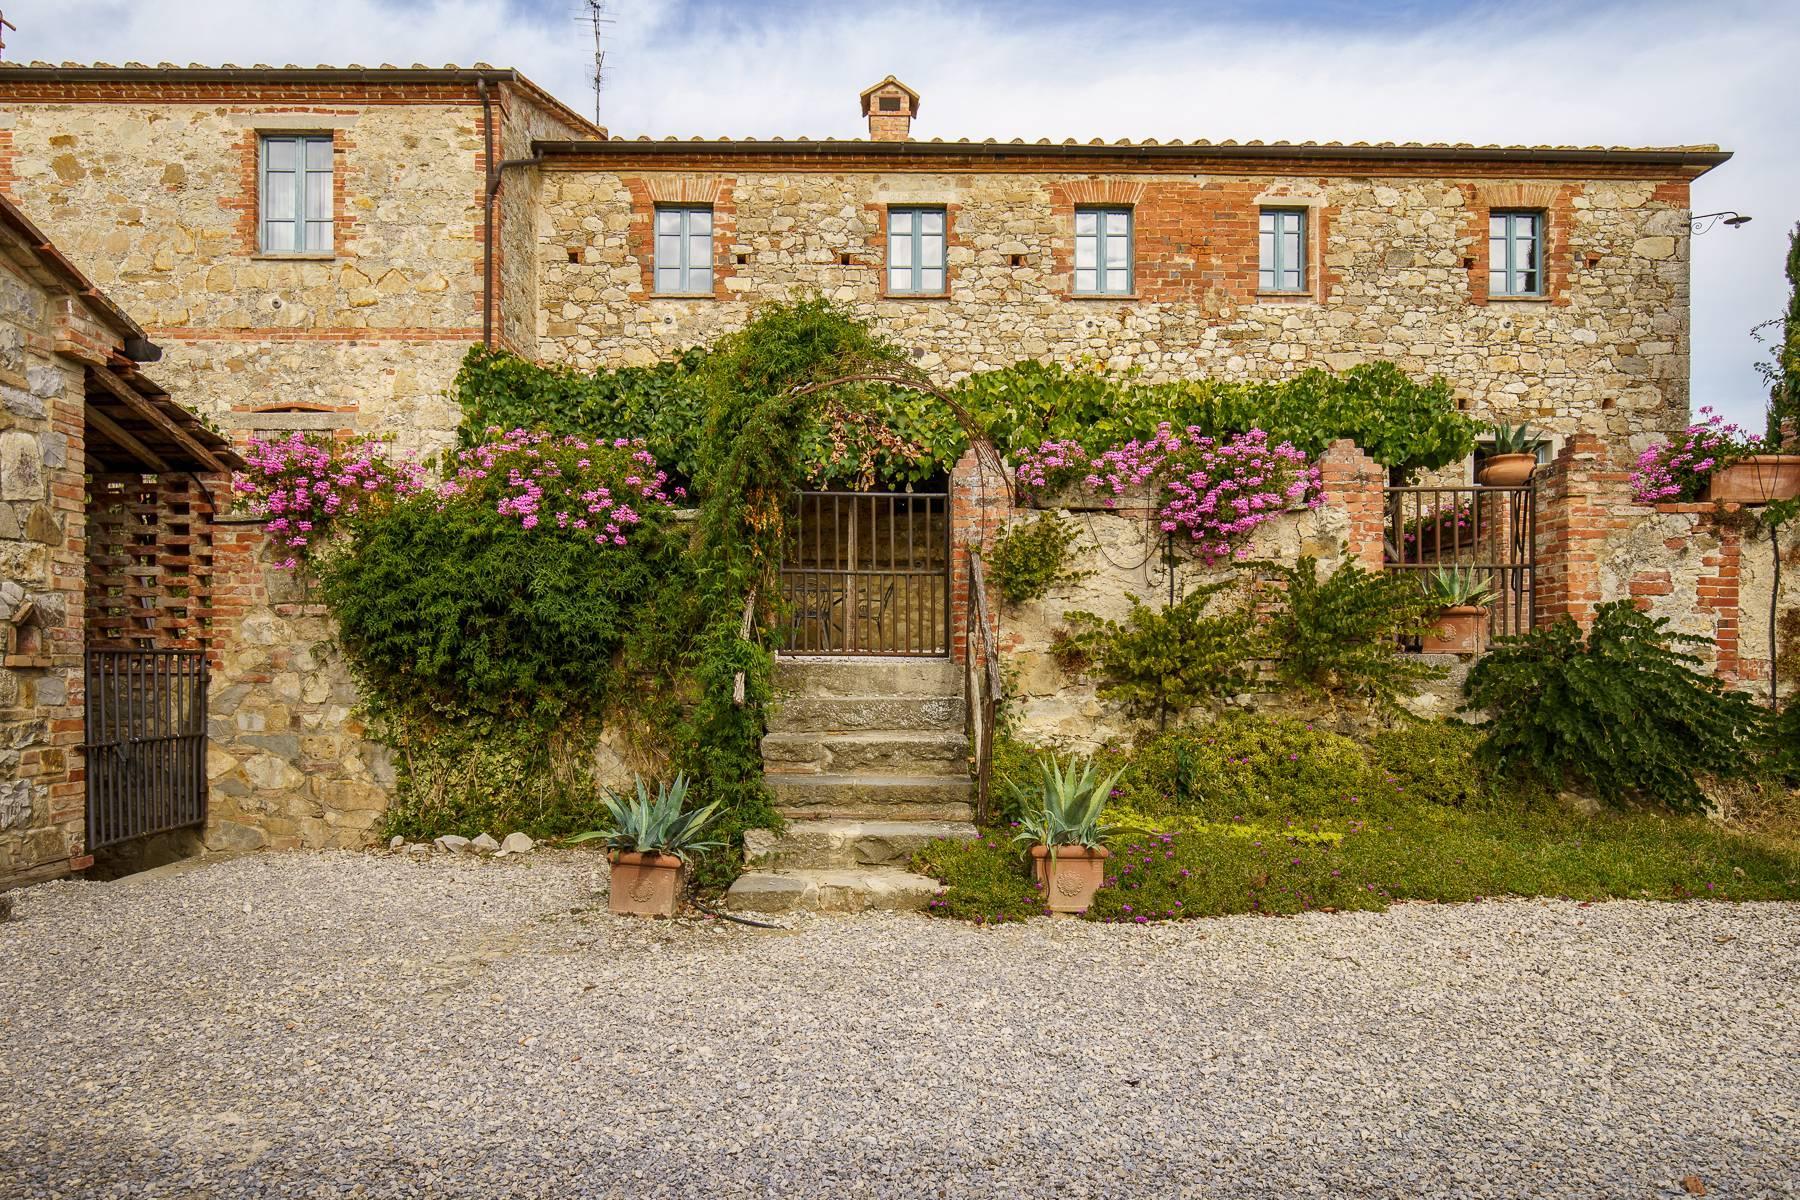 Organic winery in the heart of Crete Senesi - 6